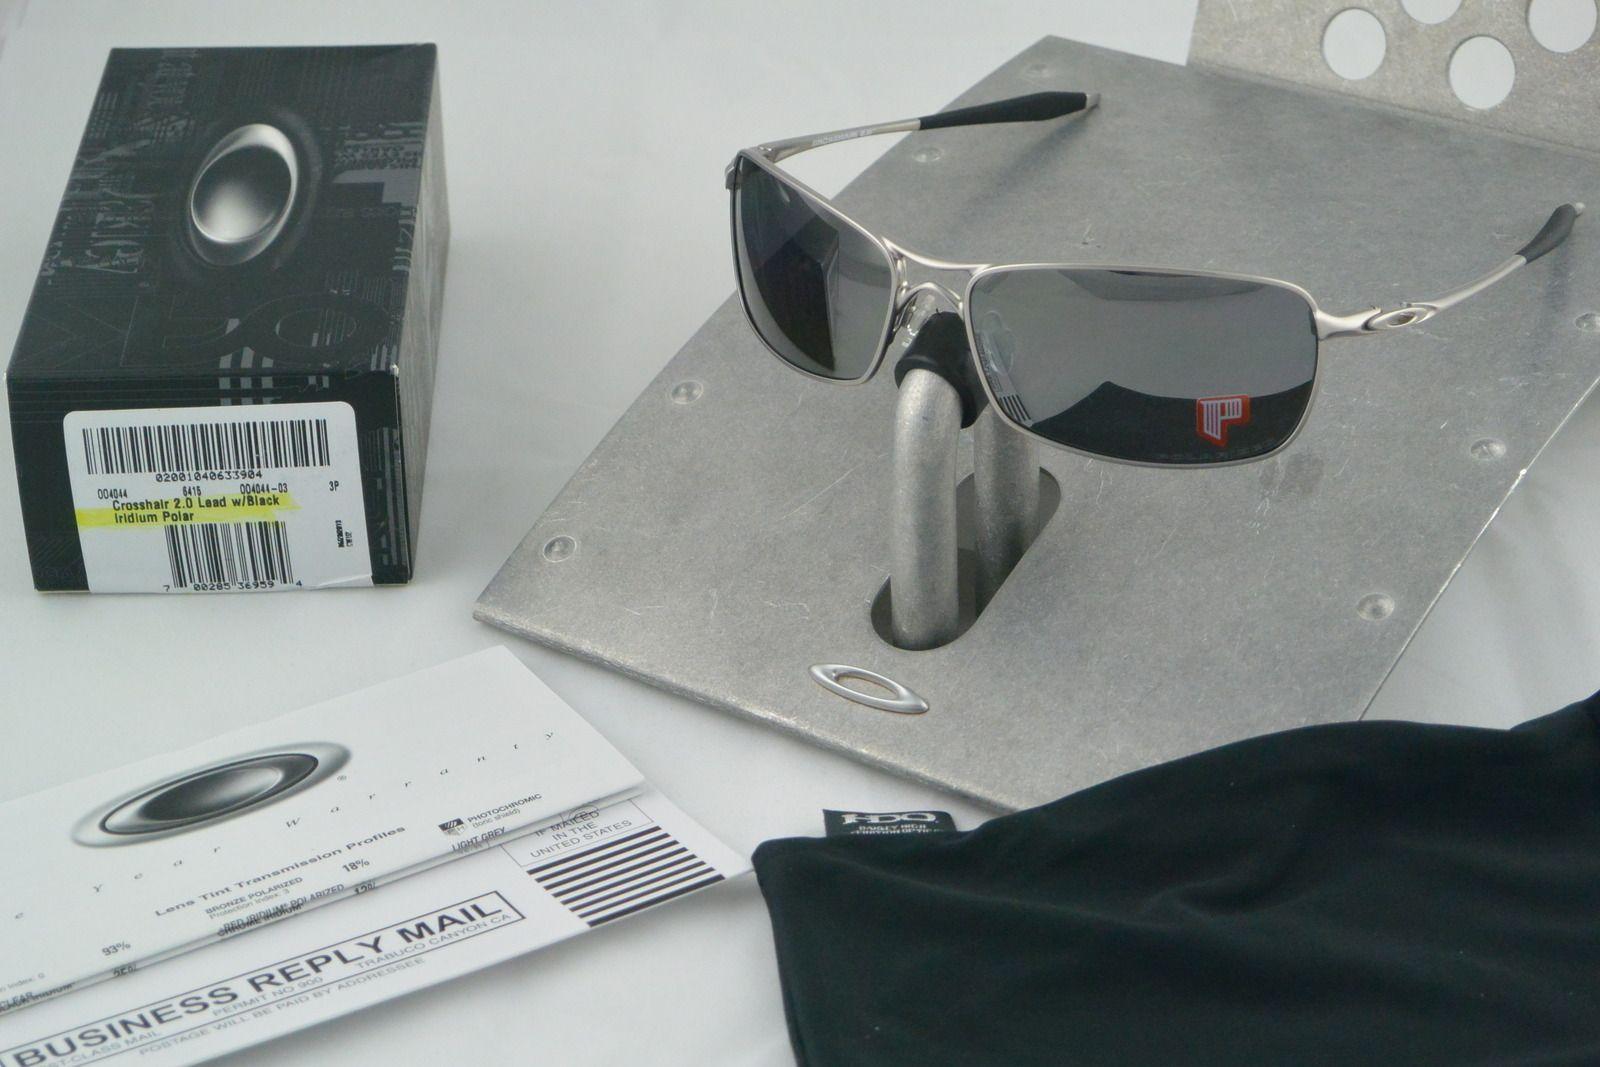 0498ab98585 For Sale - Oakley Crosshair 2.0 Polarized Sku   OO4044-03   125.00 ...